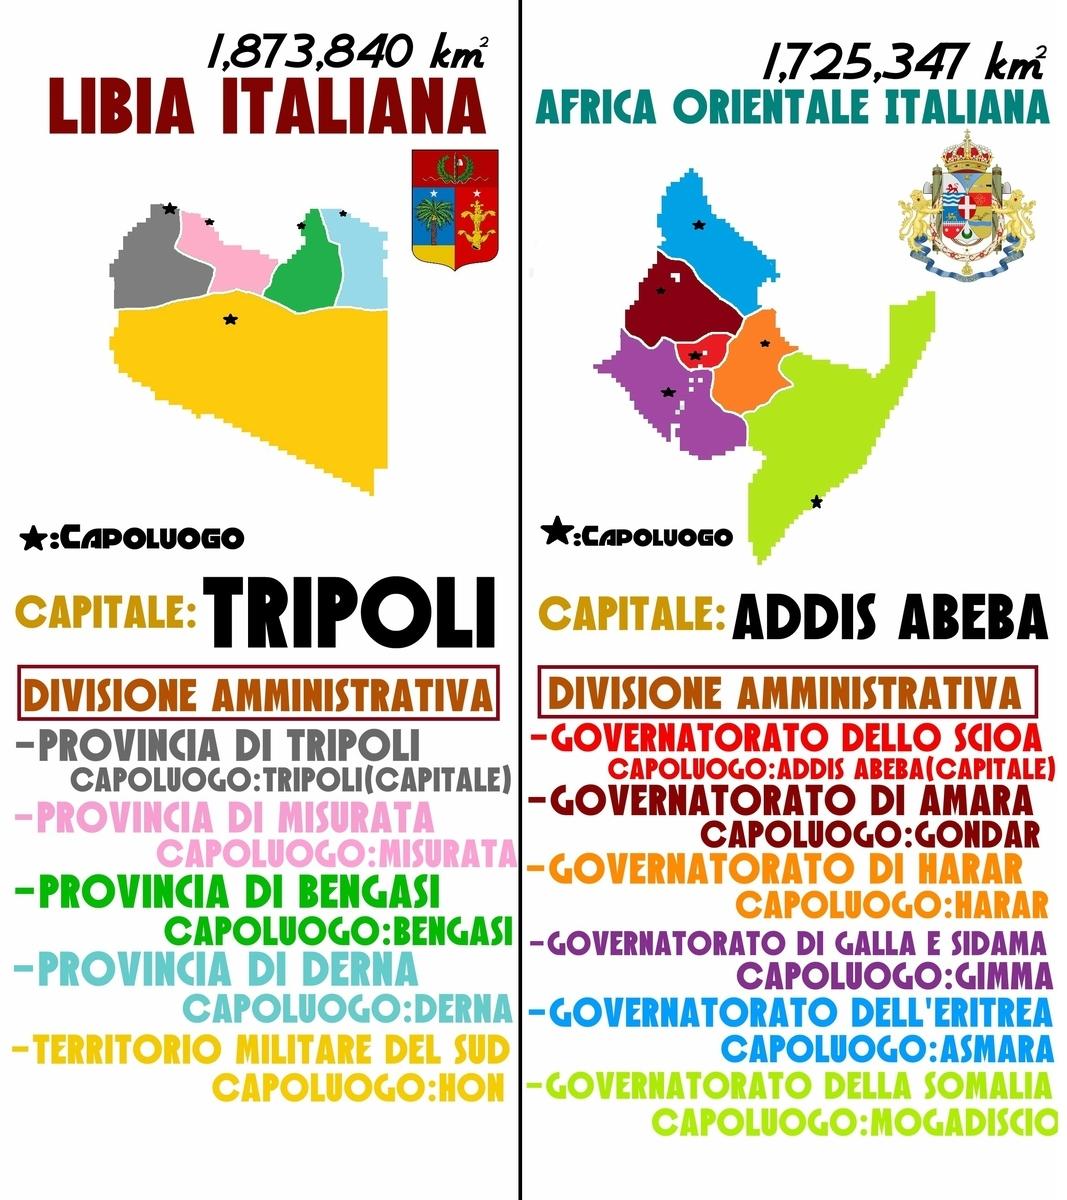 f:id:italianoluciano212:20190908205724j:plain